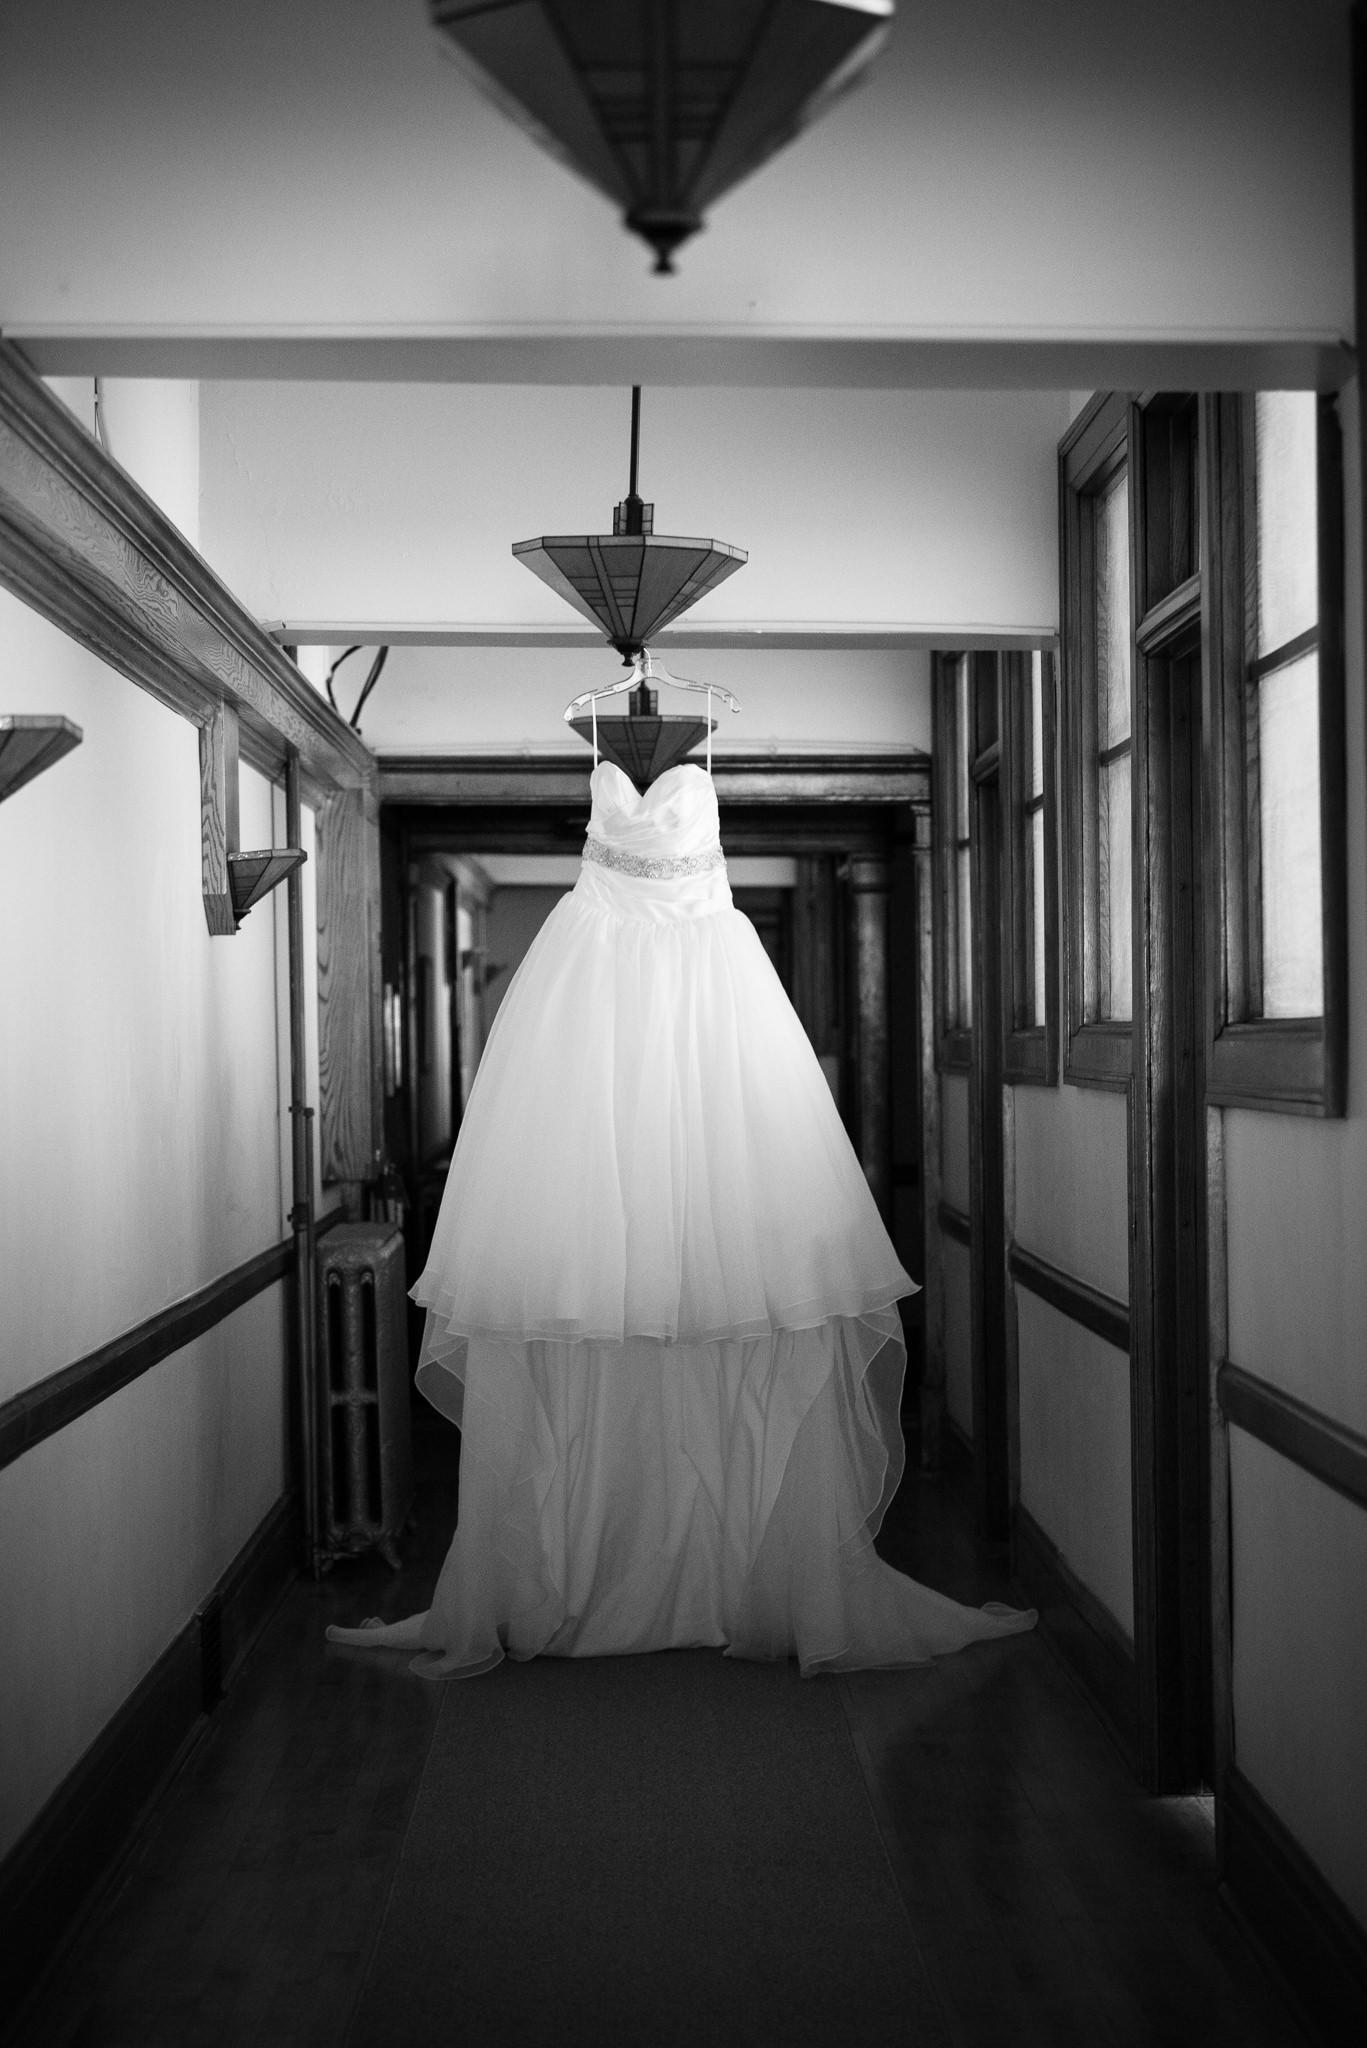 Grant Beachy Photo portrait wedding goshen elkhart south bend chicago-007.jpg